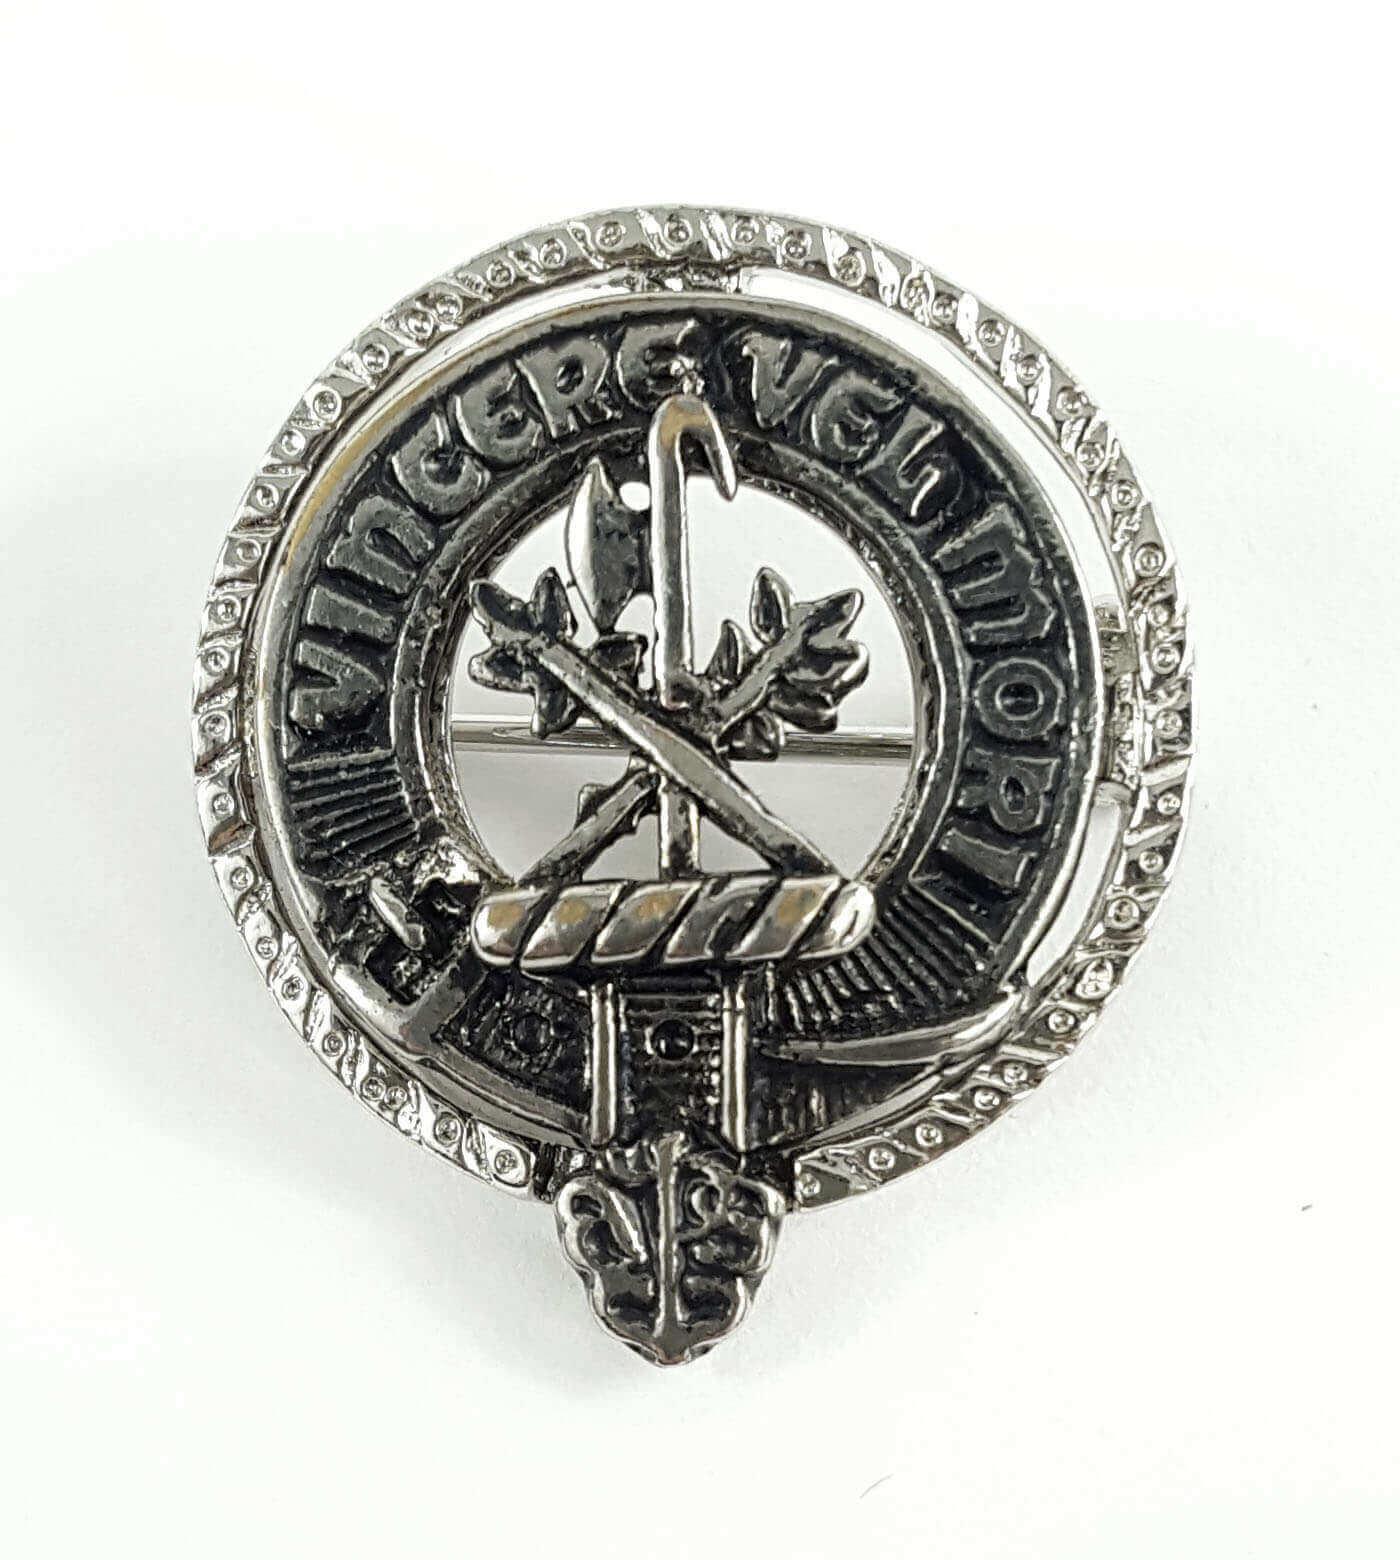 MacLaine Clan Crest Mini Brooch